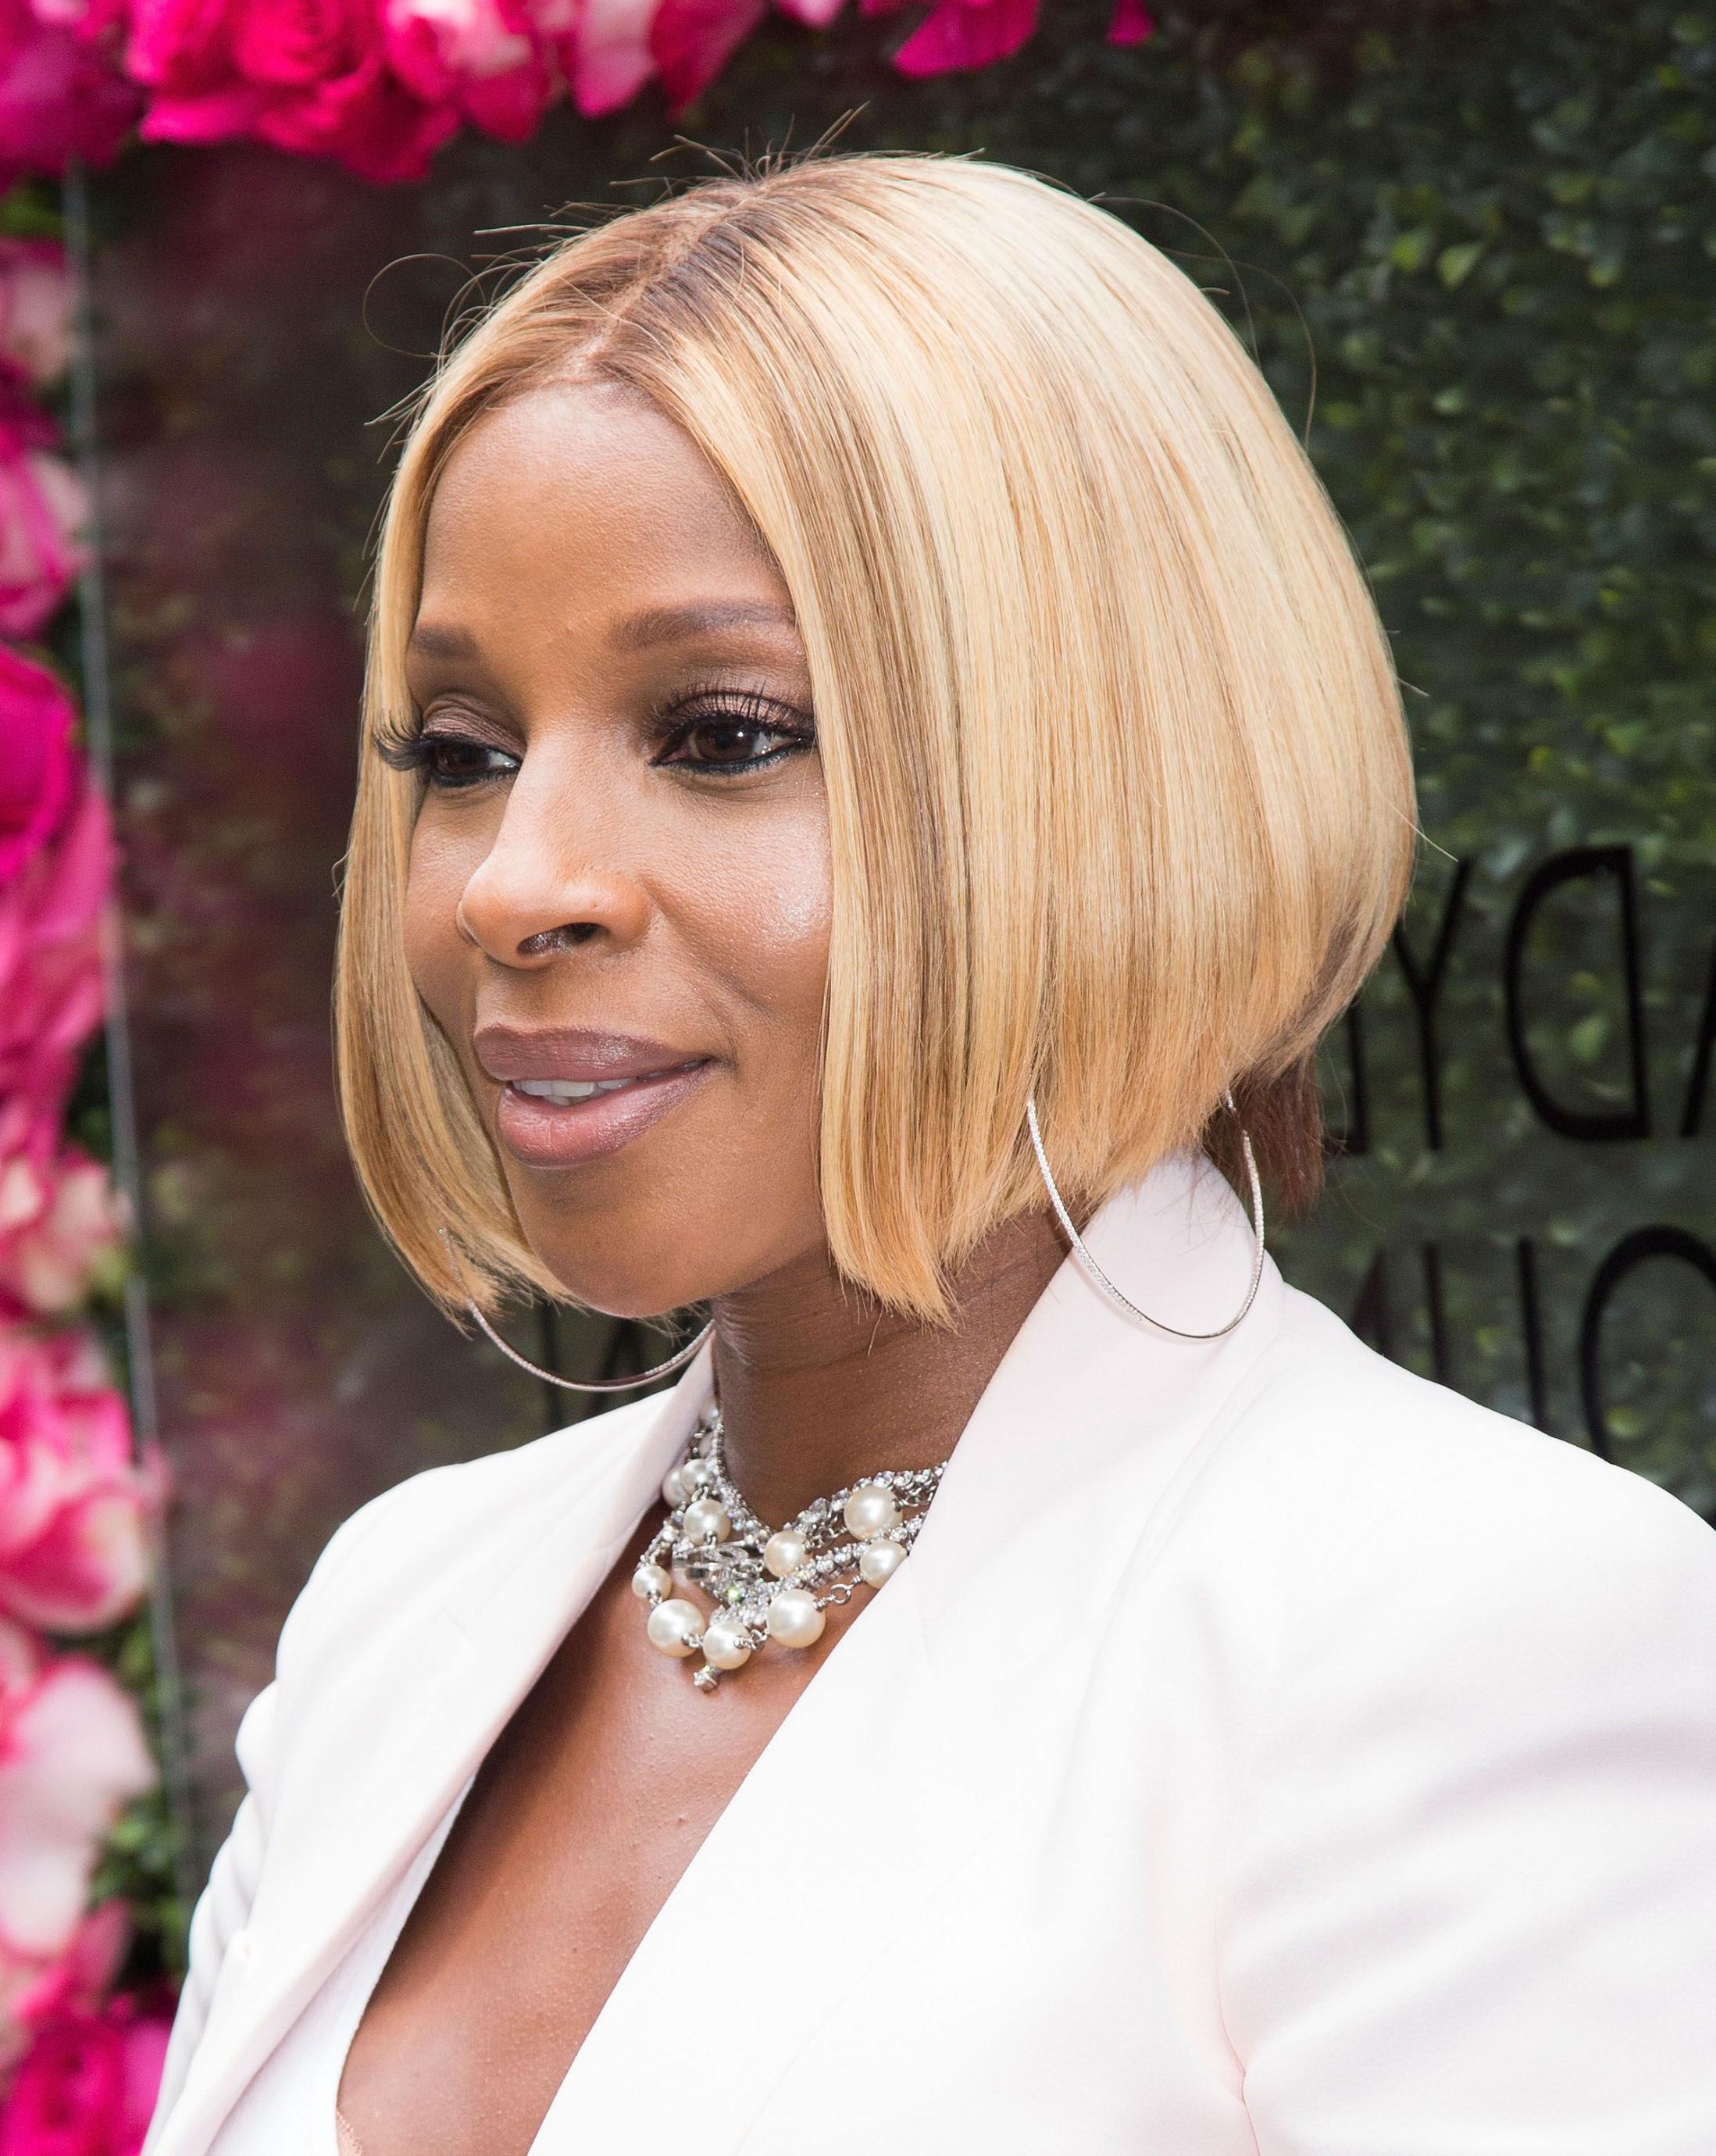 Layered Hairstyles For Black Women Beautiful Style   Hairstyles Inside Short Layered Hairstyles For Black Women (View 17 of 25)